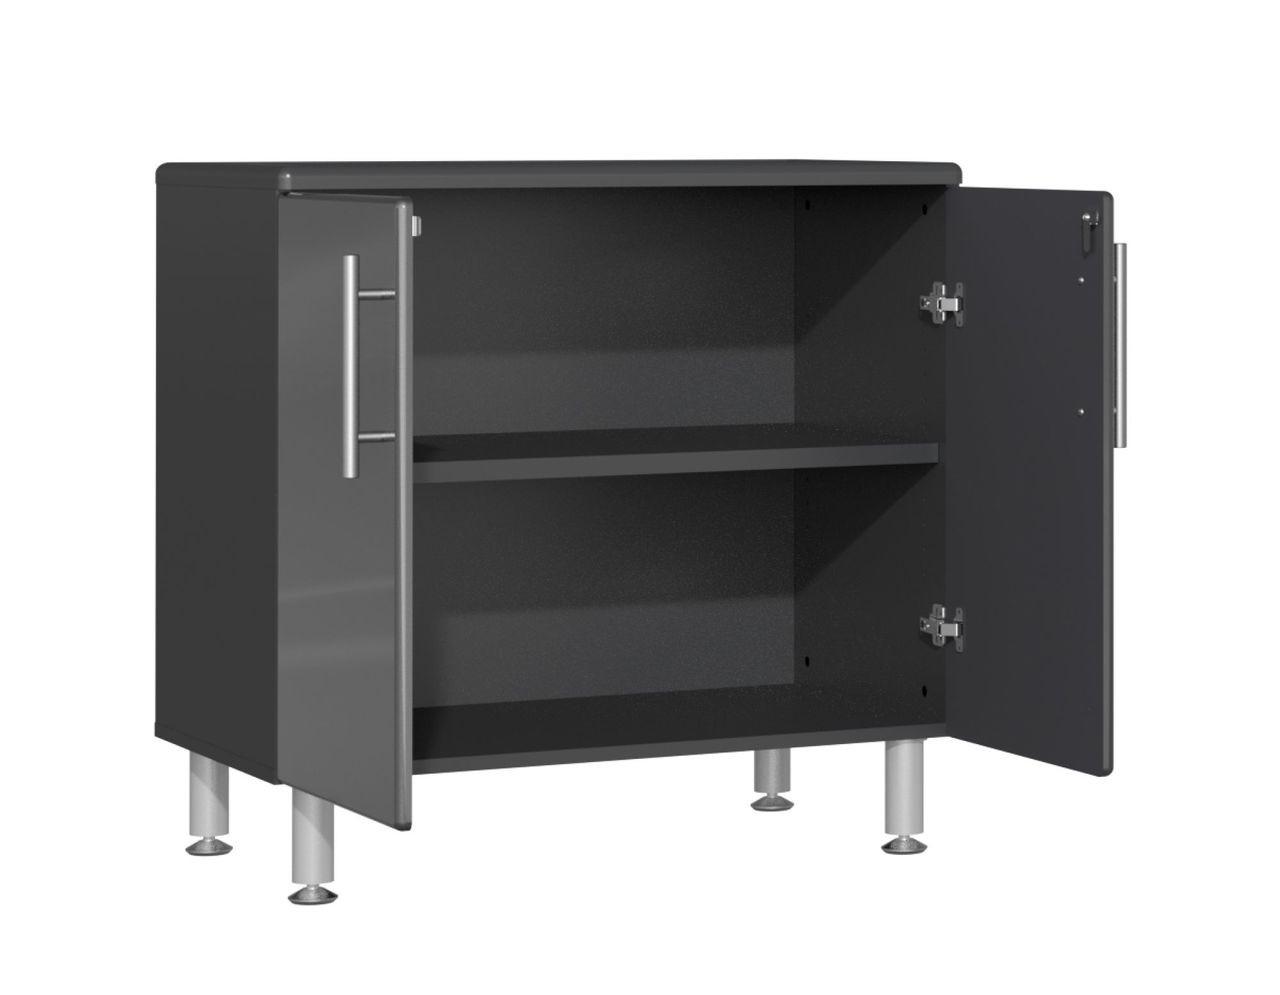 Ulti-MATE Garage 2.0 Series 3-Piece Workstation Kit (UG24032G)